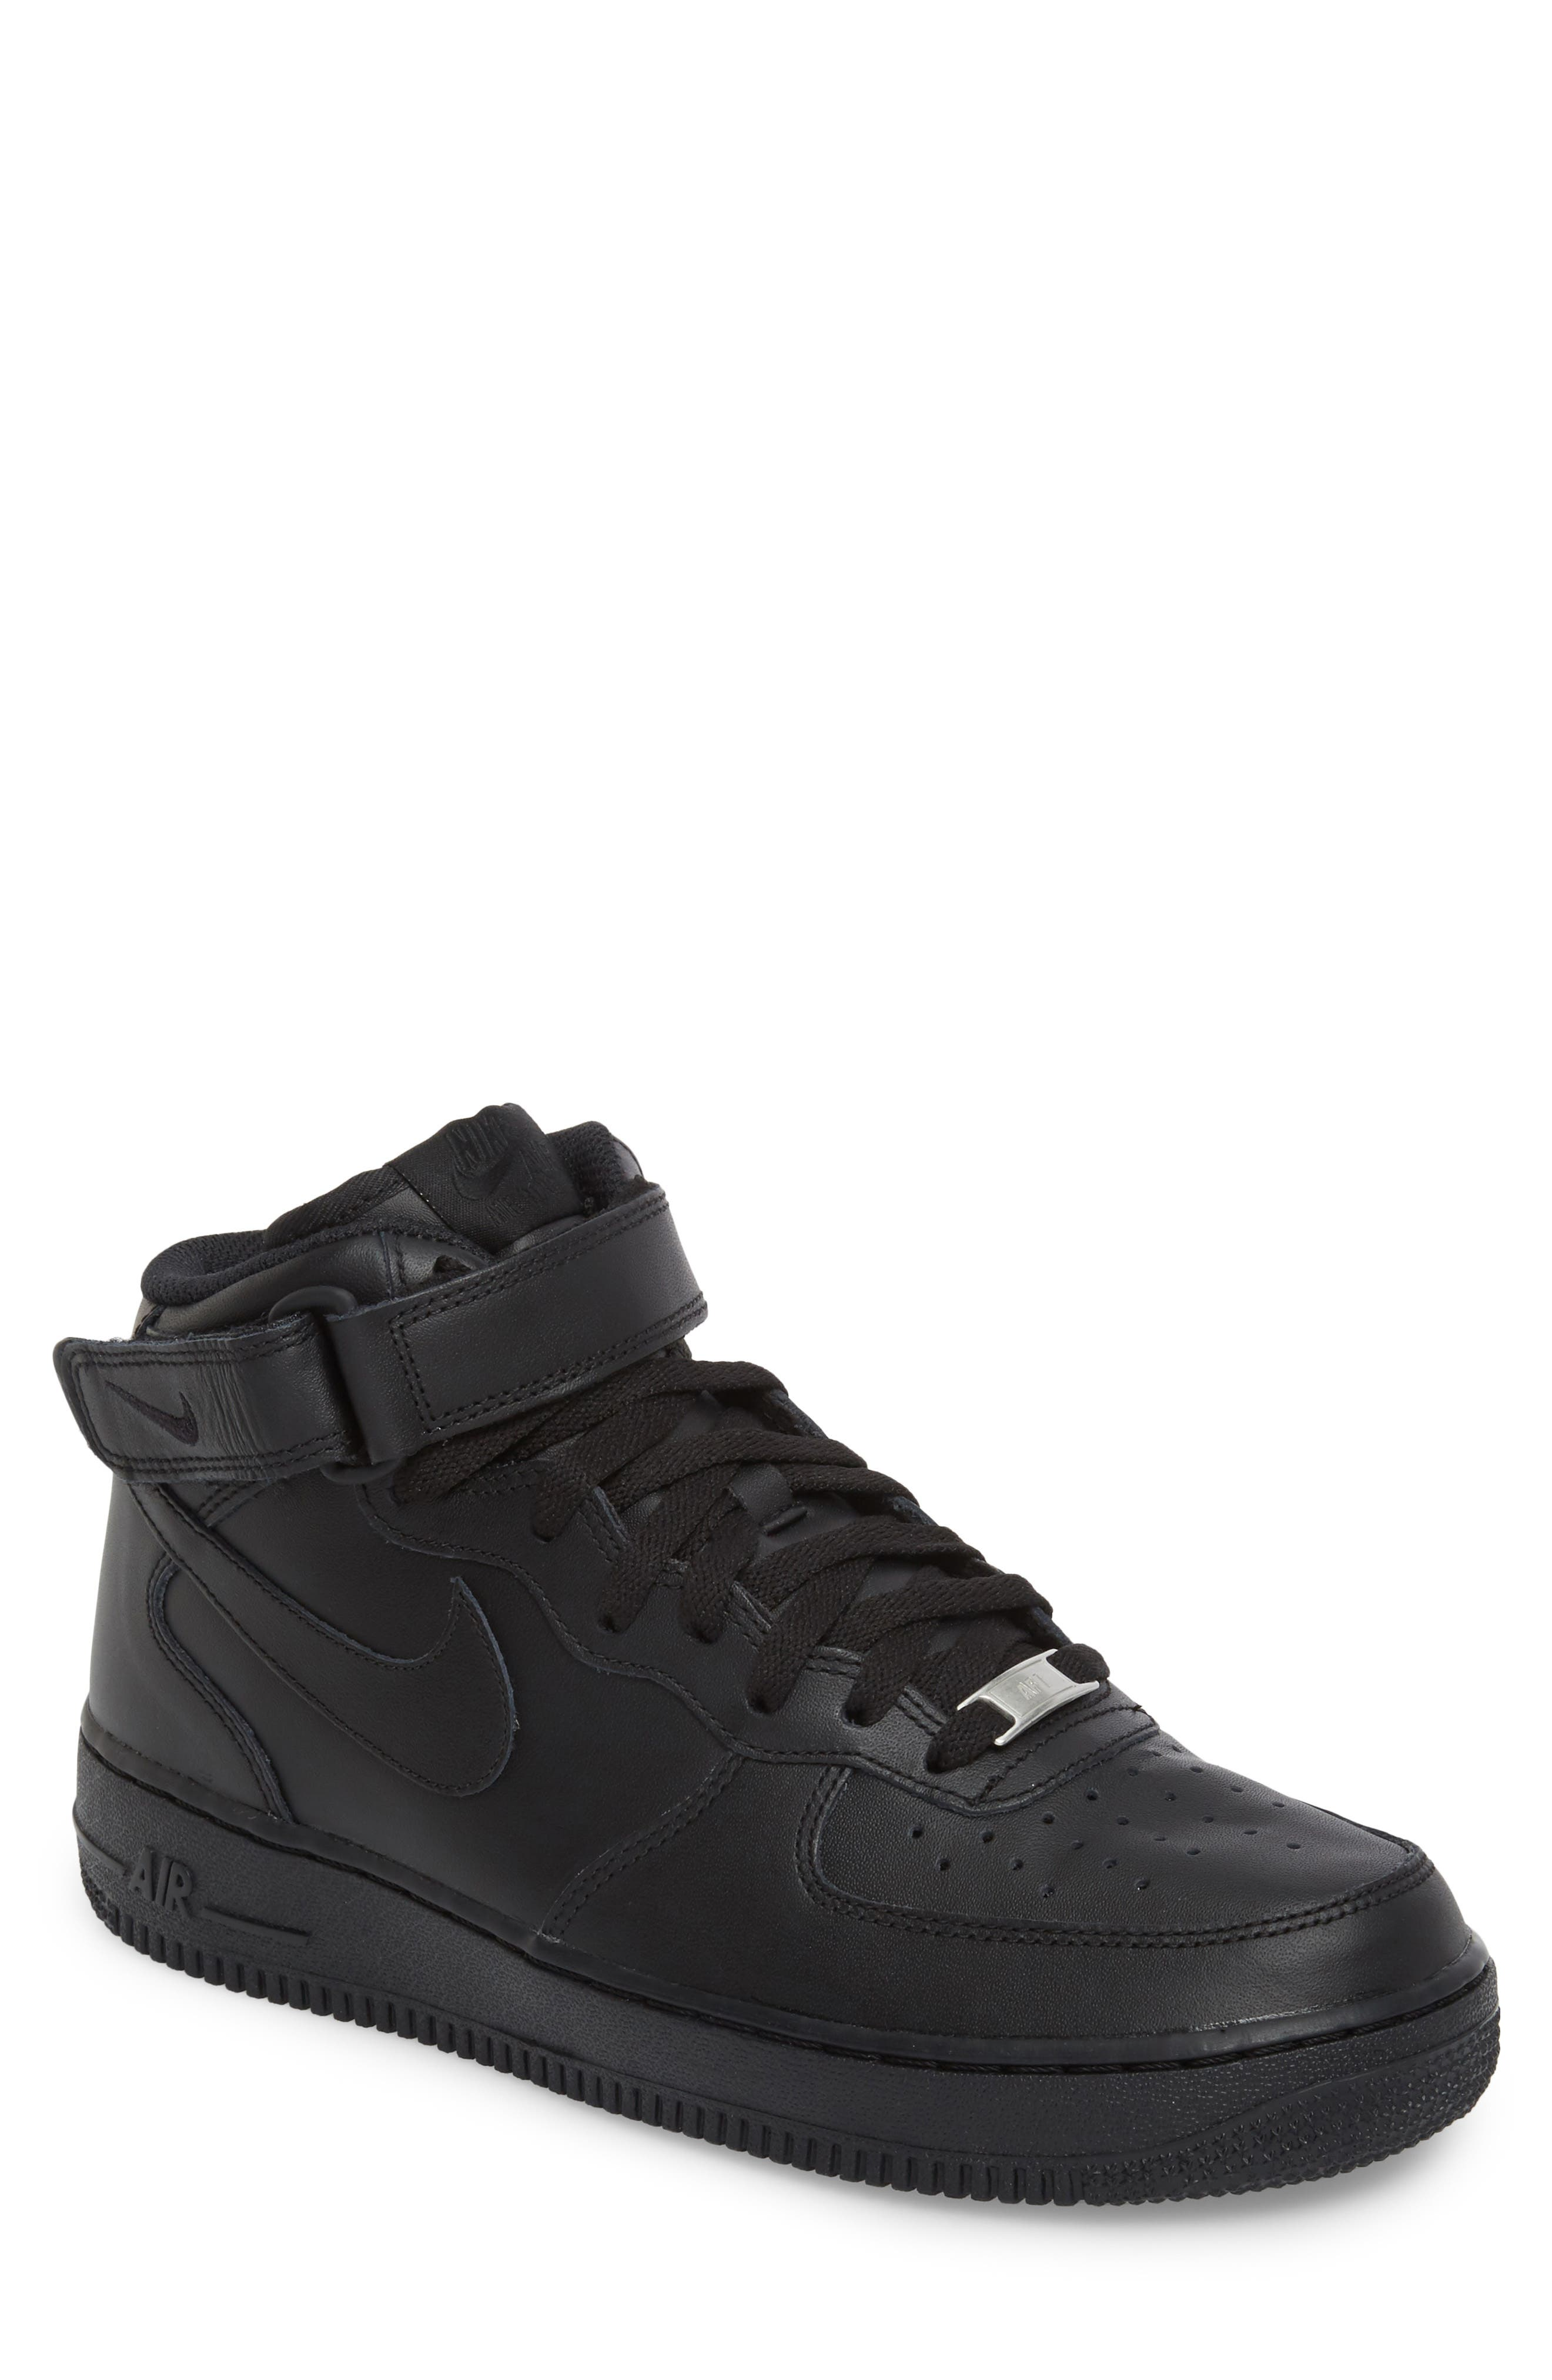 NIKE, Air Force 1 Mid '07 Sneaker, Main thumbnail 1, color, BLACK/ BLACK